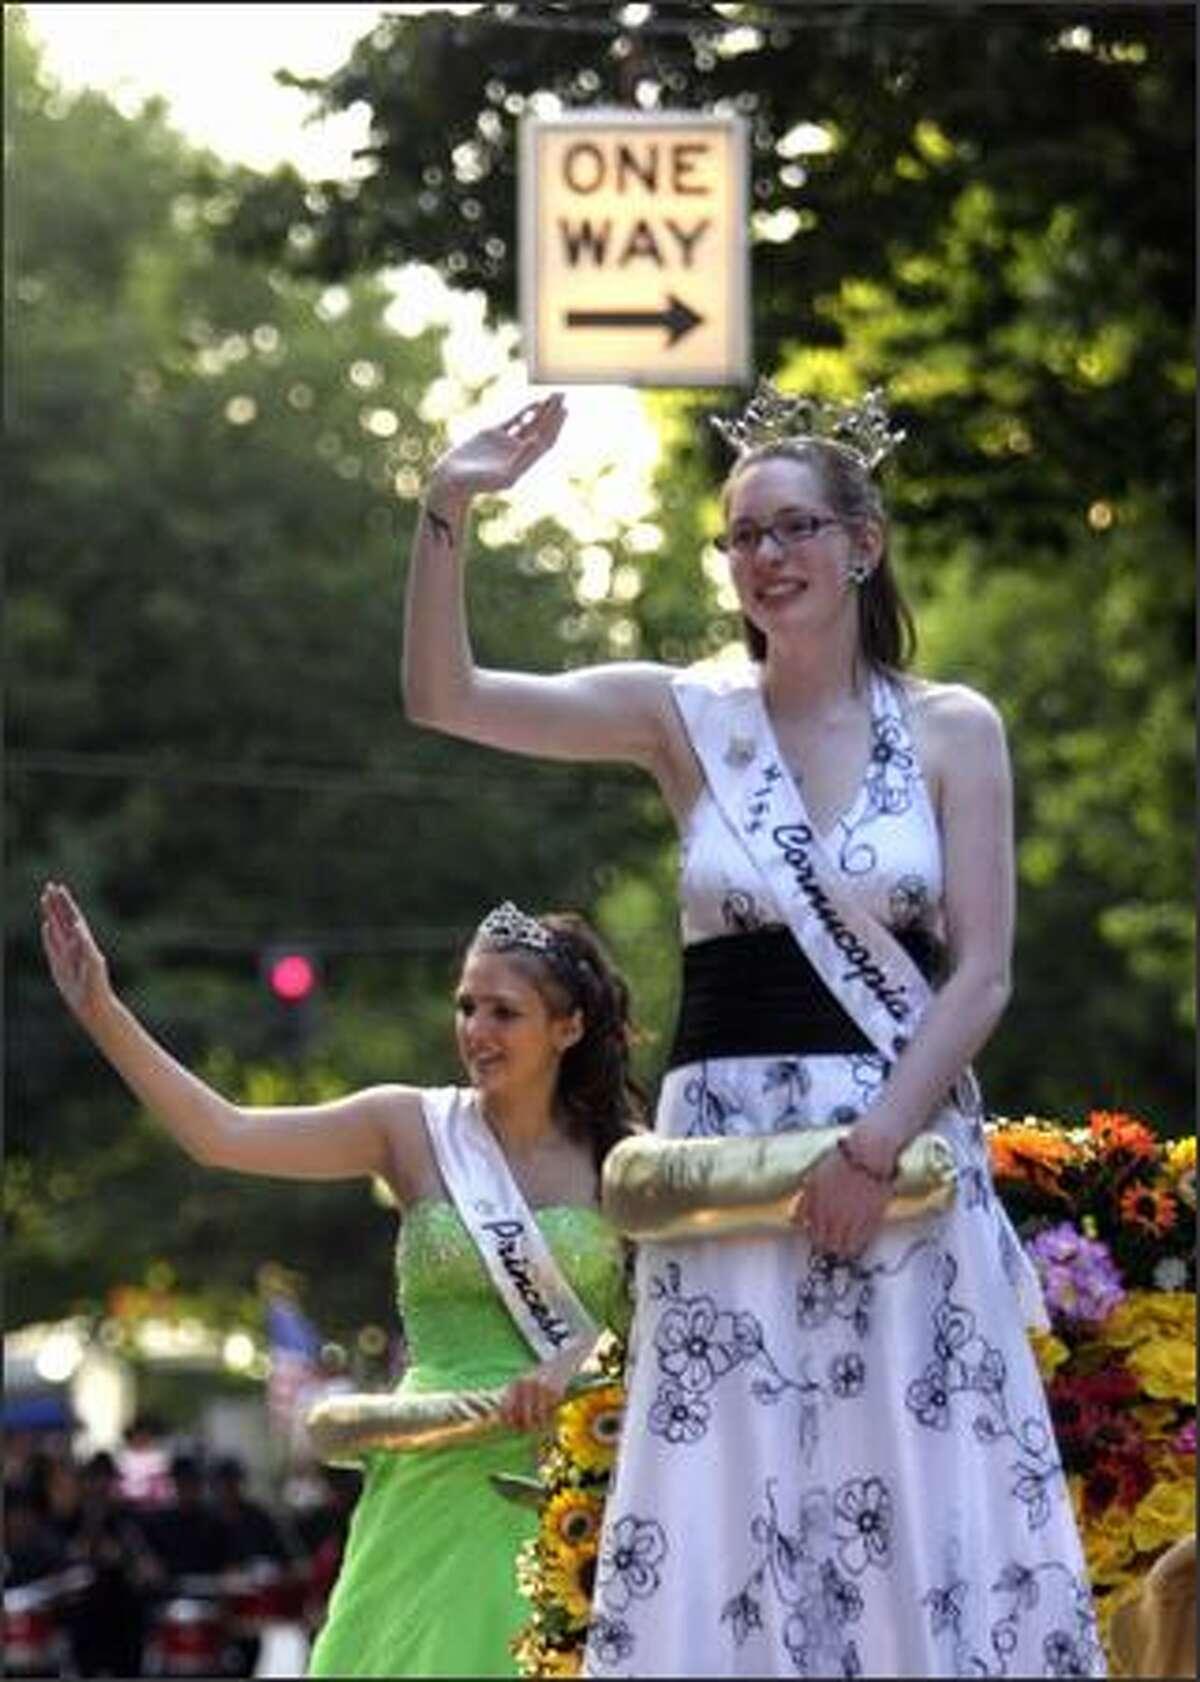 Nicole Oliver, Miss Cornucopia 2008, and Tasha Nelson, the Royal Princess, ride upon the Kent Cornucopia Days float in the Torchlight Parade.